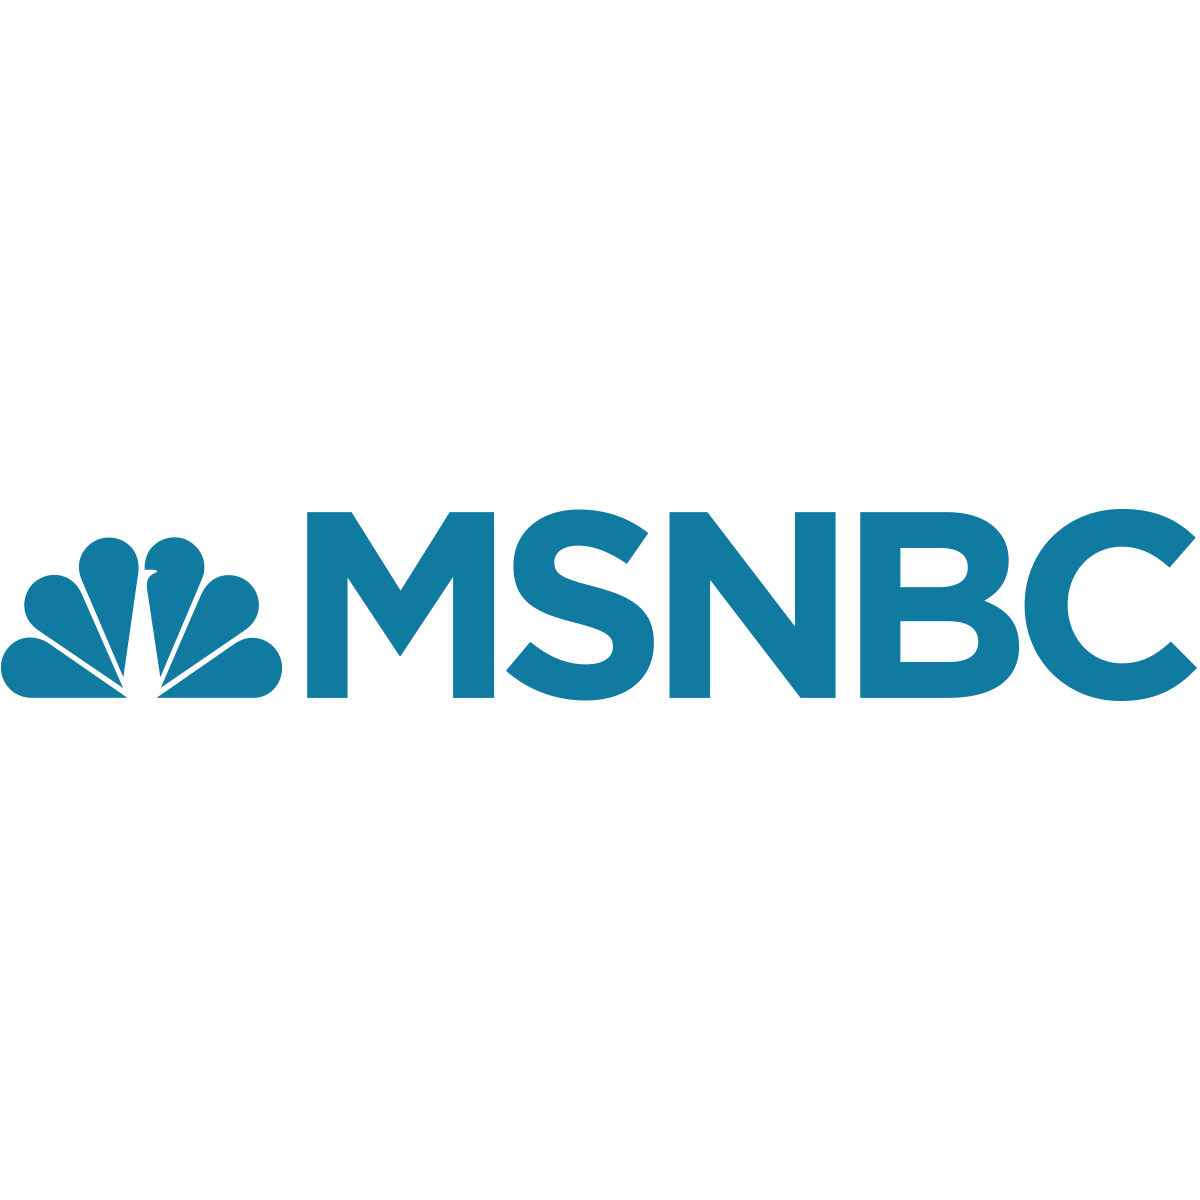 msnbc-blue